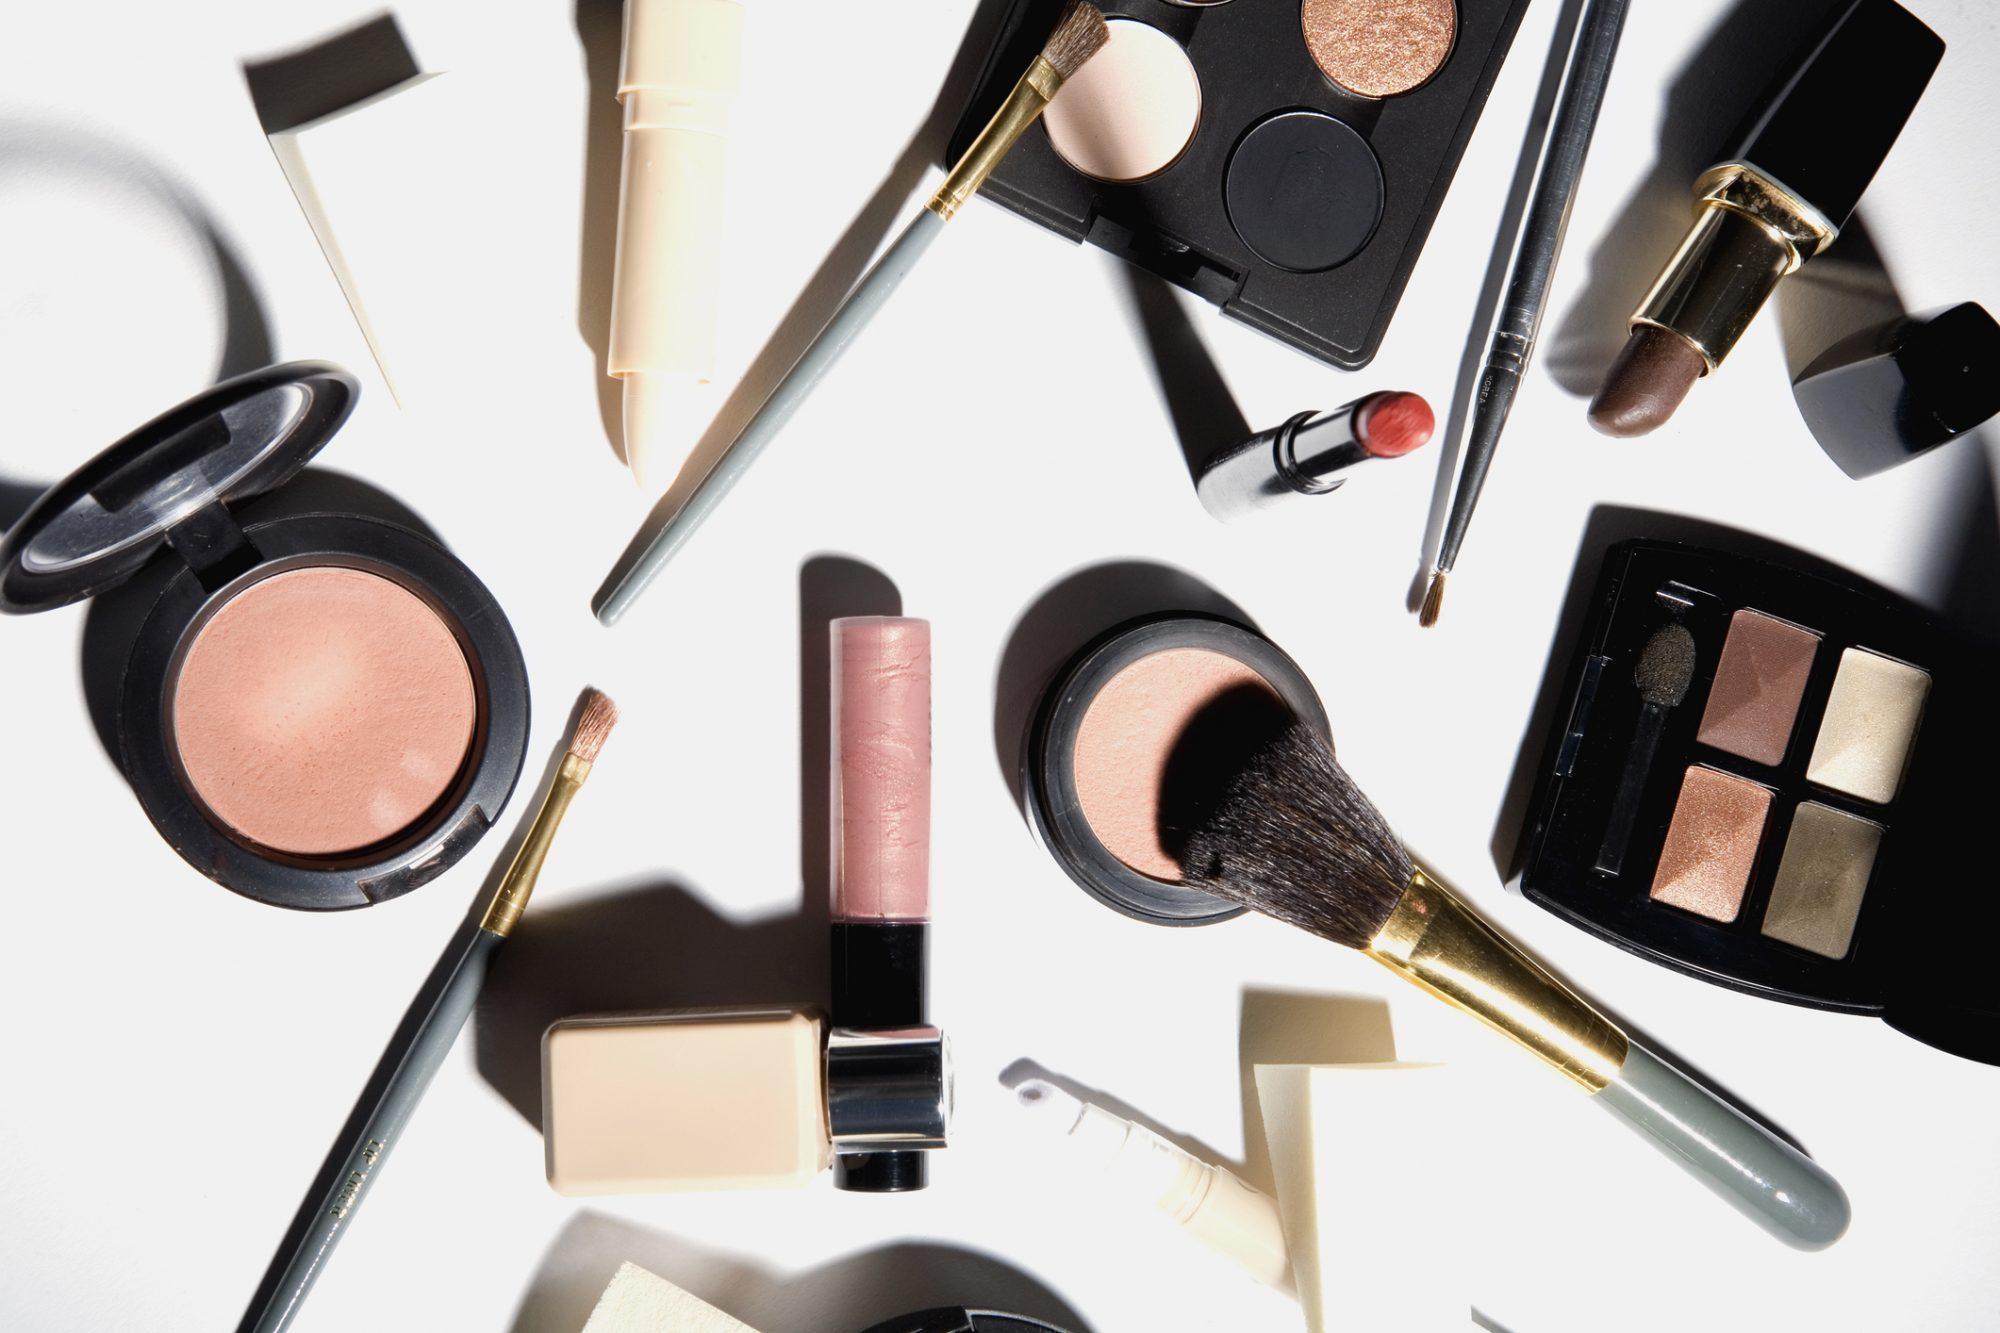 High angle view of cosmetics